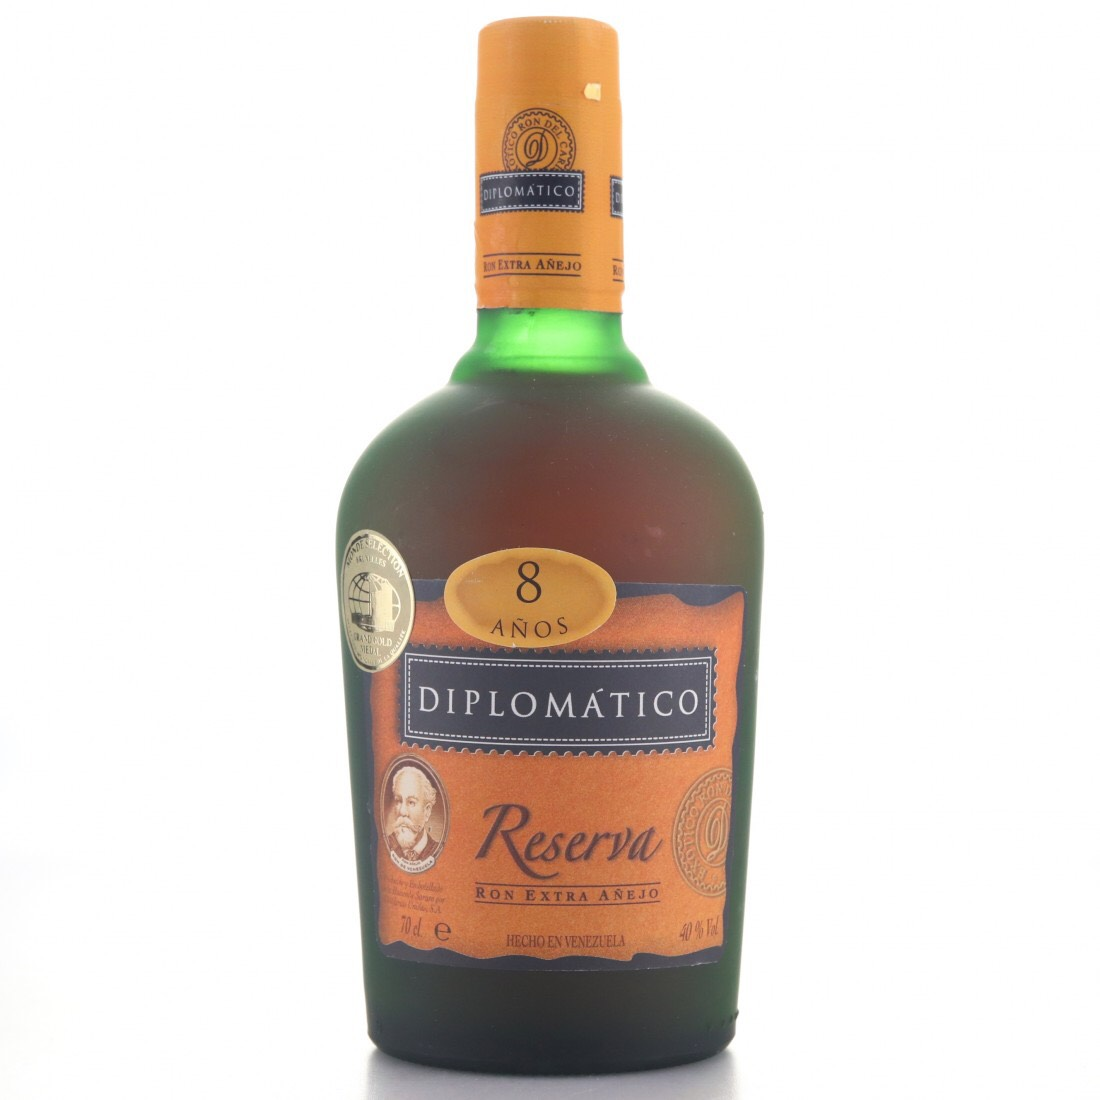 Bottle image of Diplomático / Botucal Reserva 8 Años